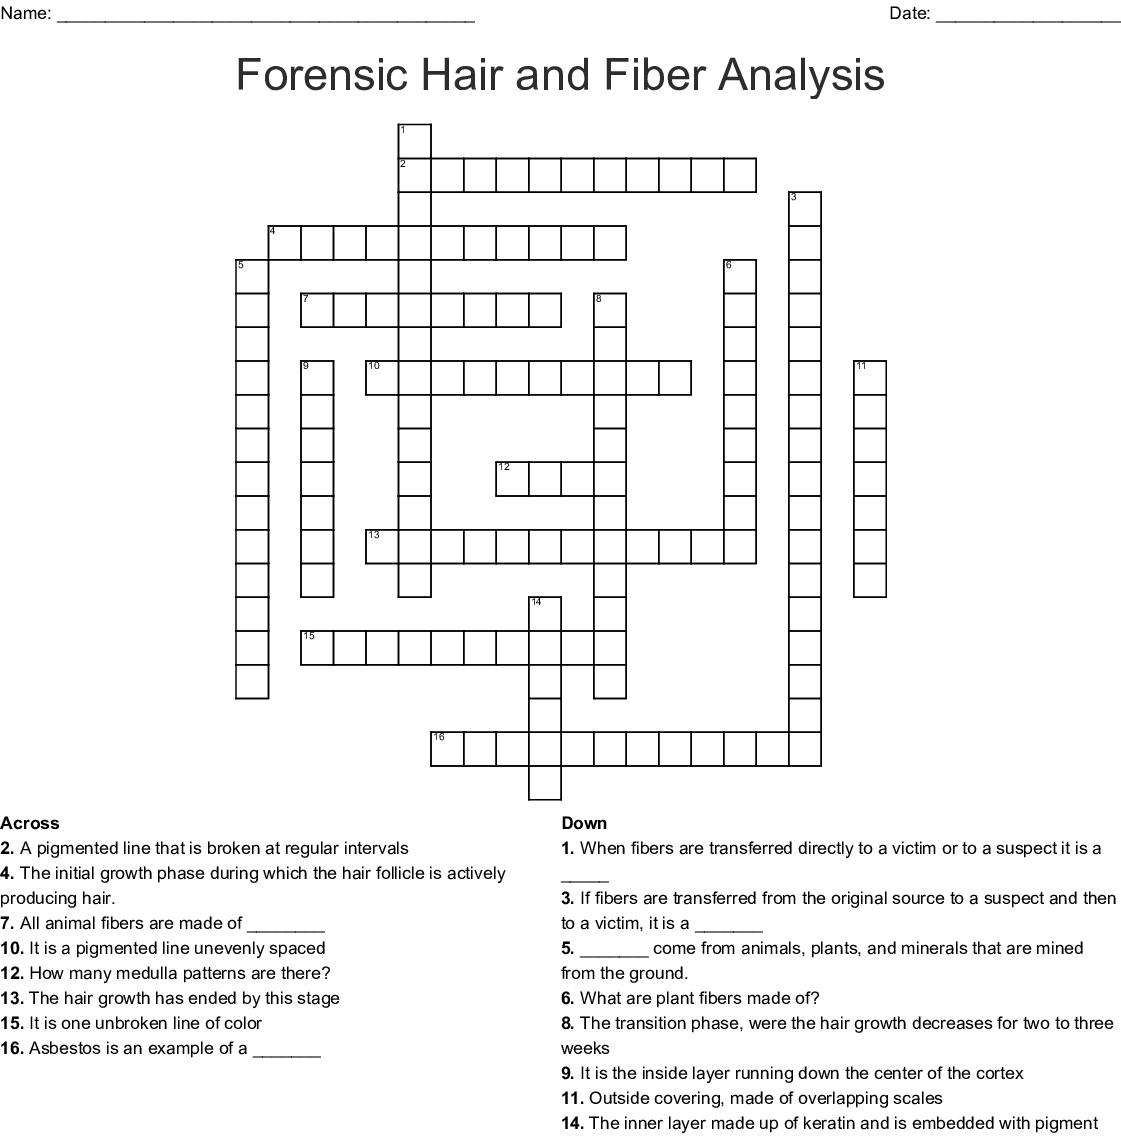 Forensic Hair And Fiber Analysis Crossword Wordmint